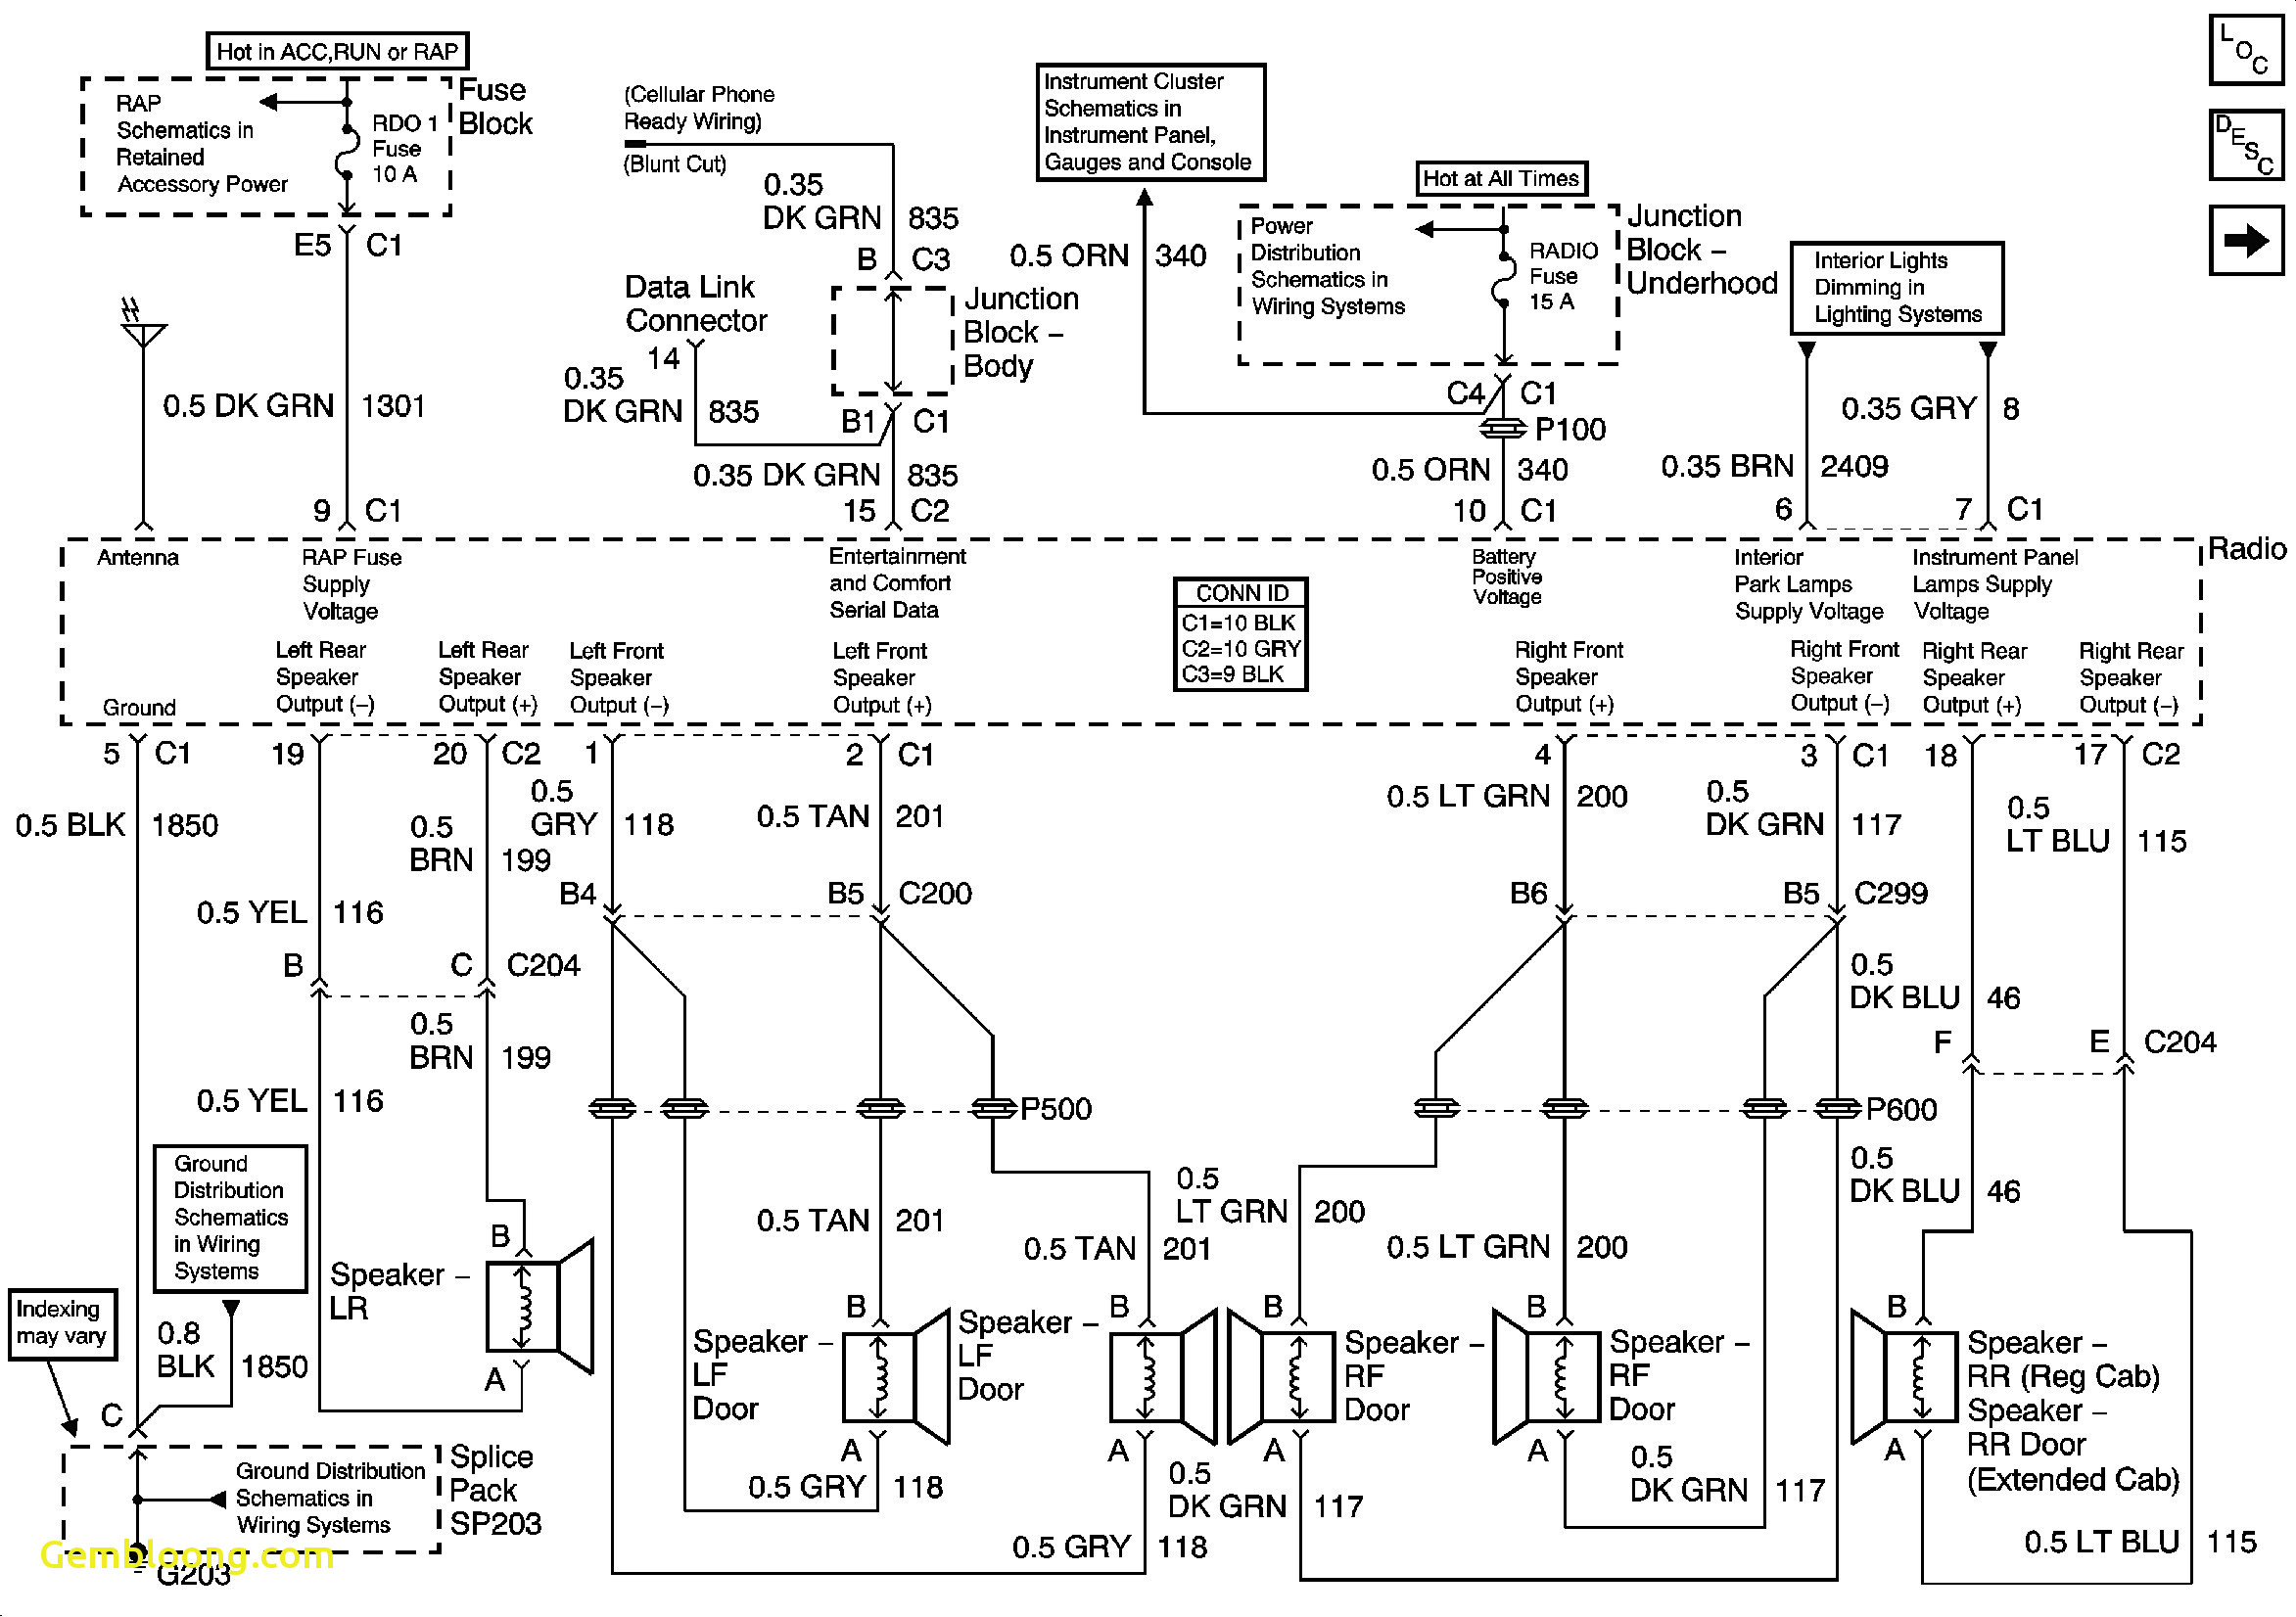 [SODI_2457]   VR_3544] Actuator Wiring Diagrams By Byrnetown78 Schematic Wiring | Viper 4105v Wiring Diagram 2004 Gmc Yukon |  | Ariot Pap Mohammedshrine Librar Wiring 101